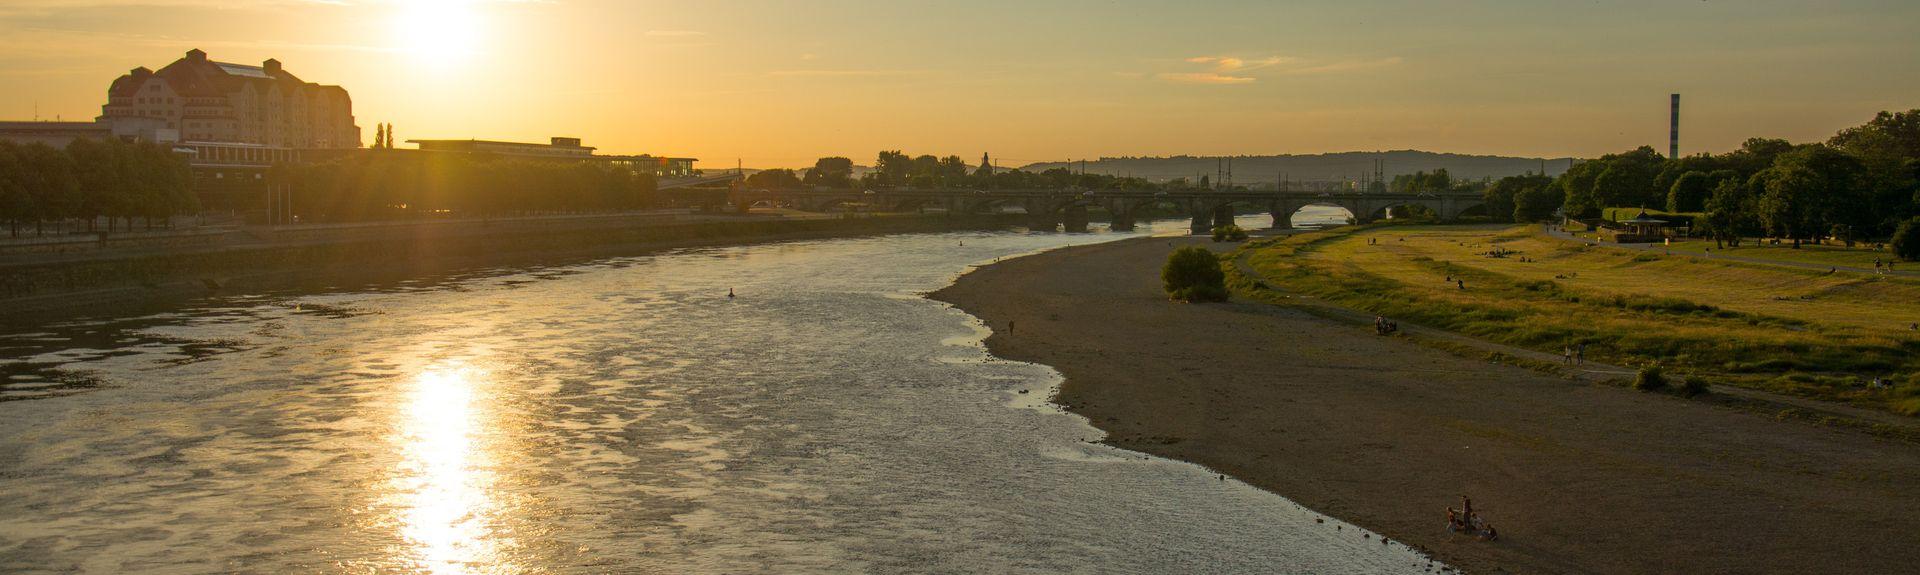 Randstad Neustadt, Dresden, Saksen, Duitsland